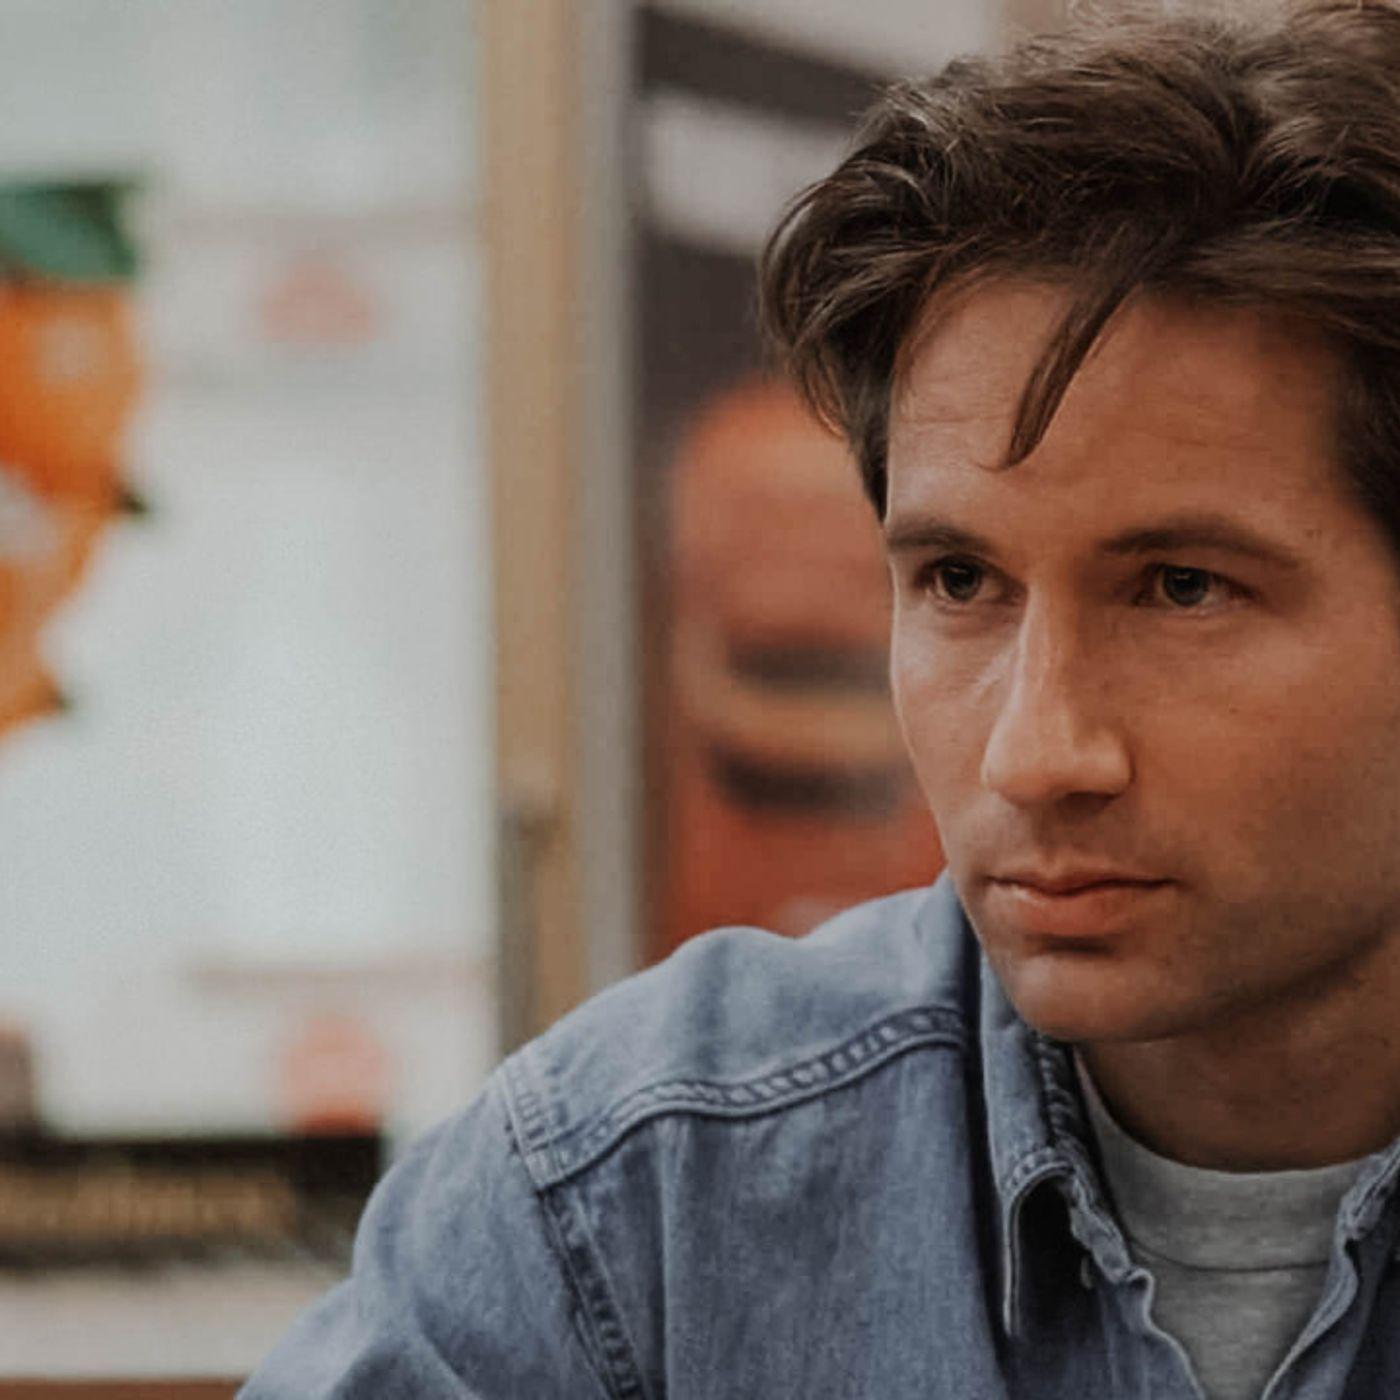 295. Fox Mulder in Season One